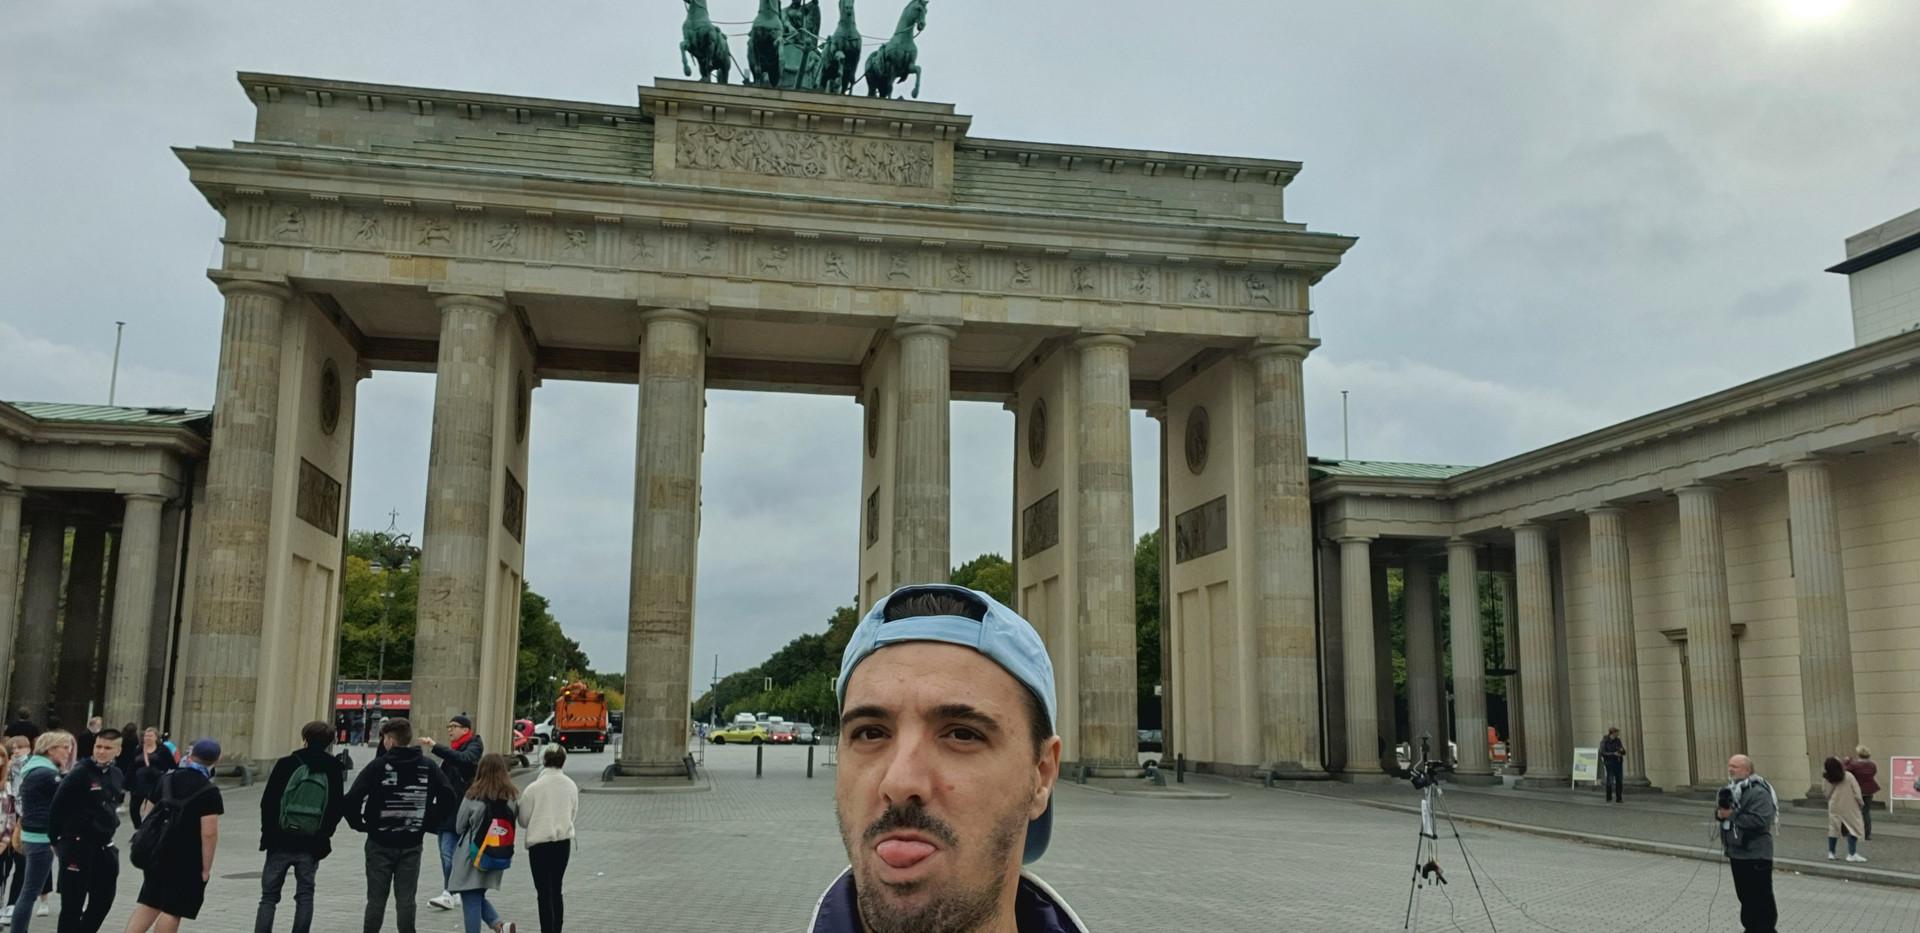 Brandenburger Tor!